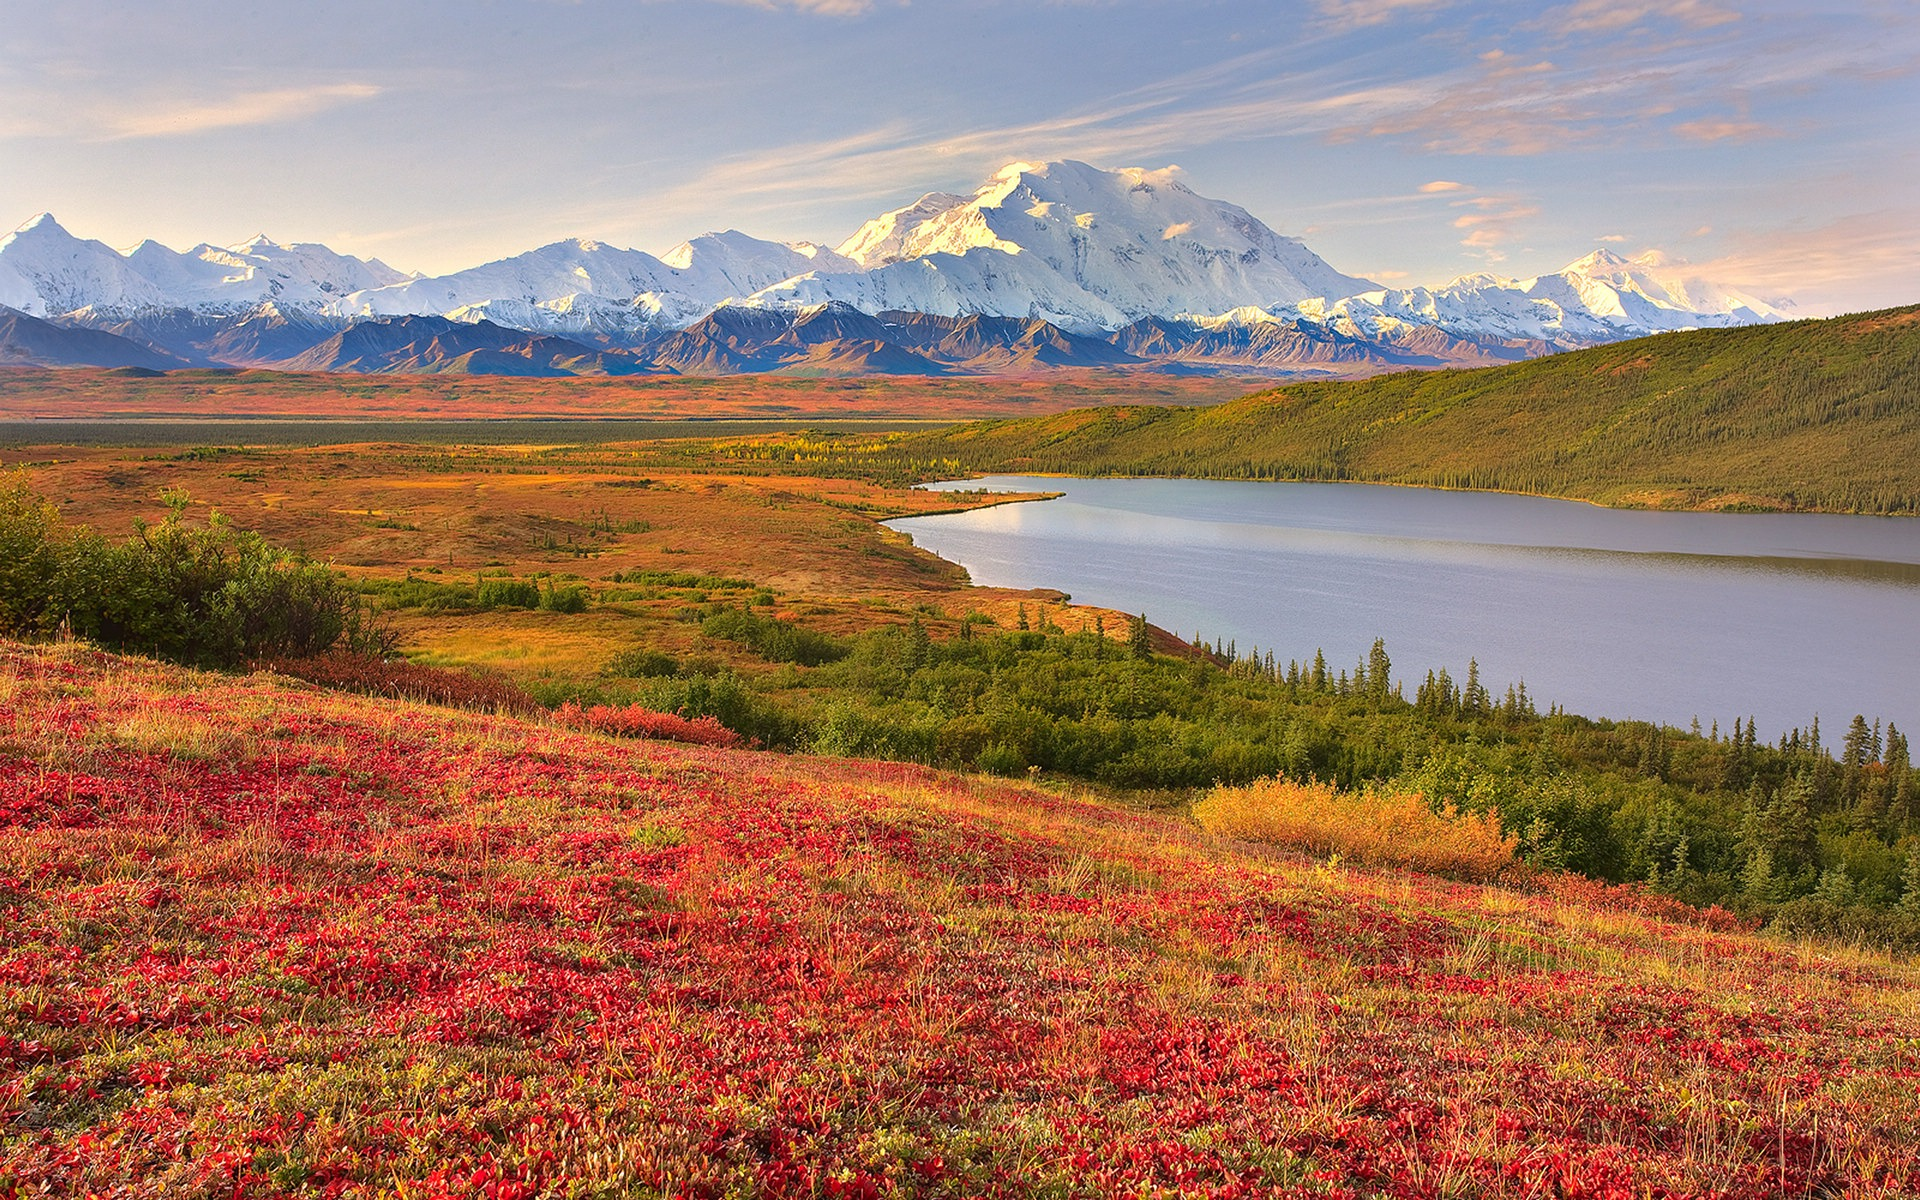 Denali National Park Beautiful Landscape HD Wallpaper 1920x1200